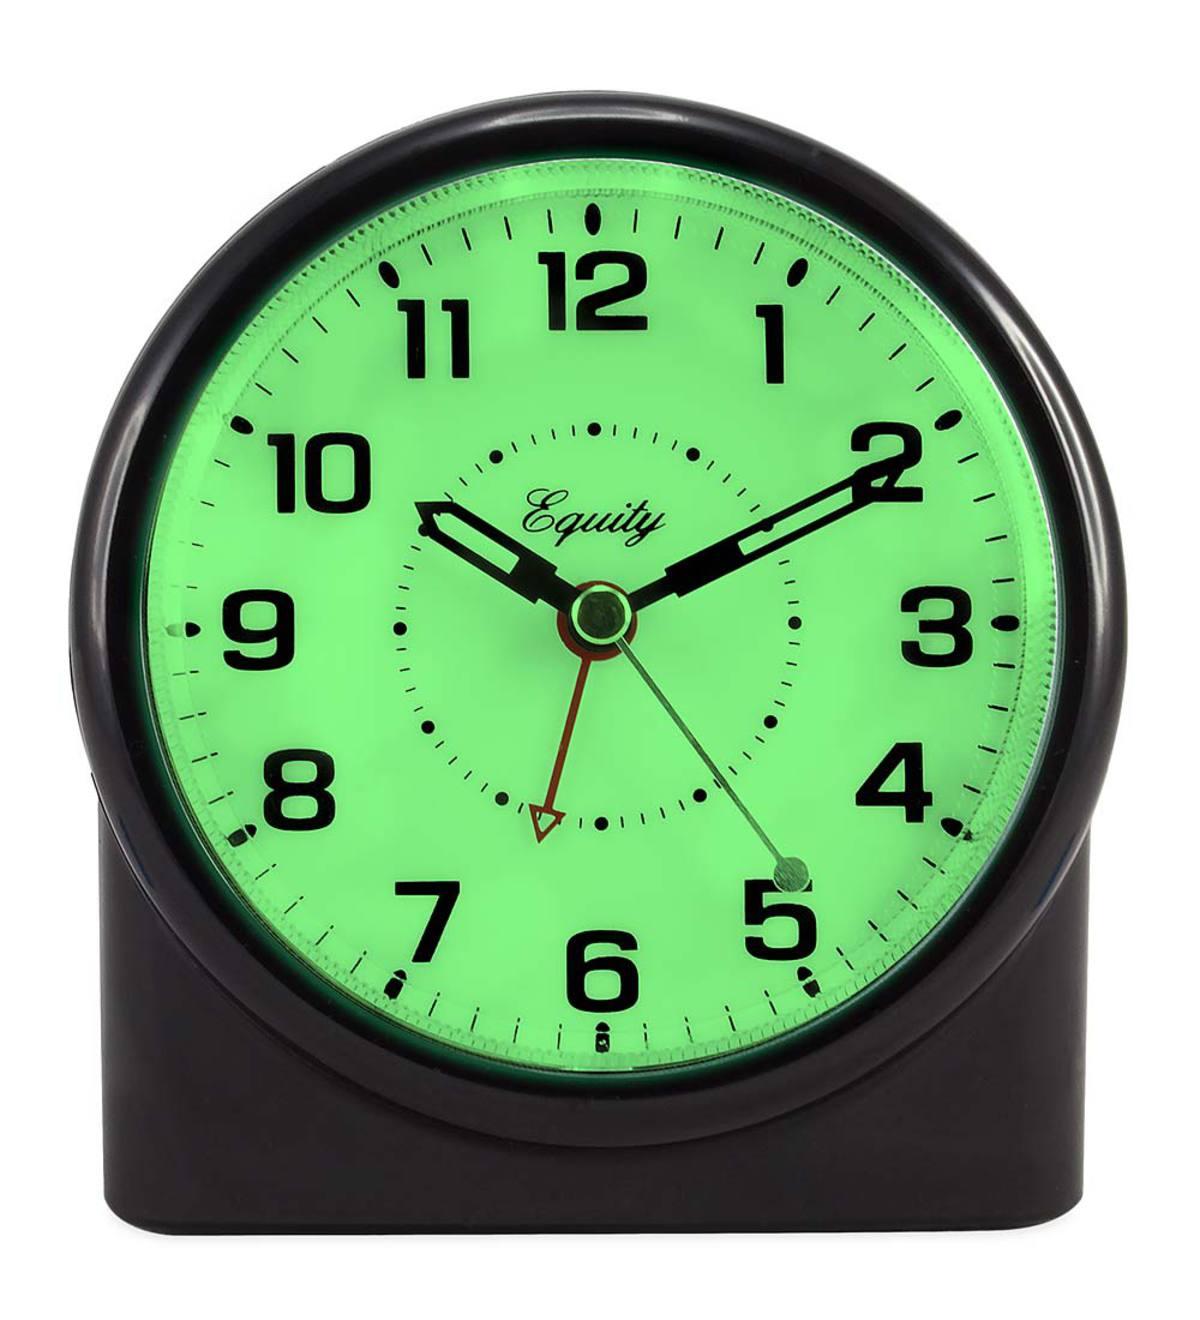 Backlit Analog Alarm Clock   Wind and Weather